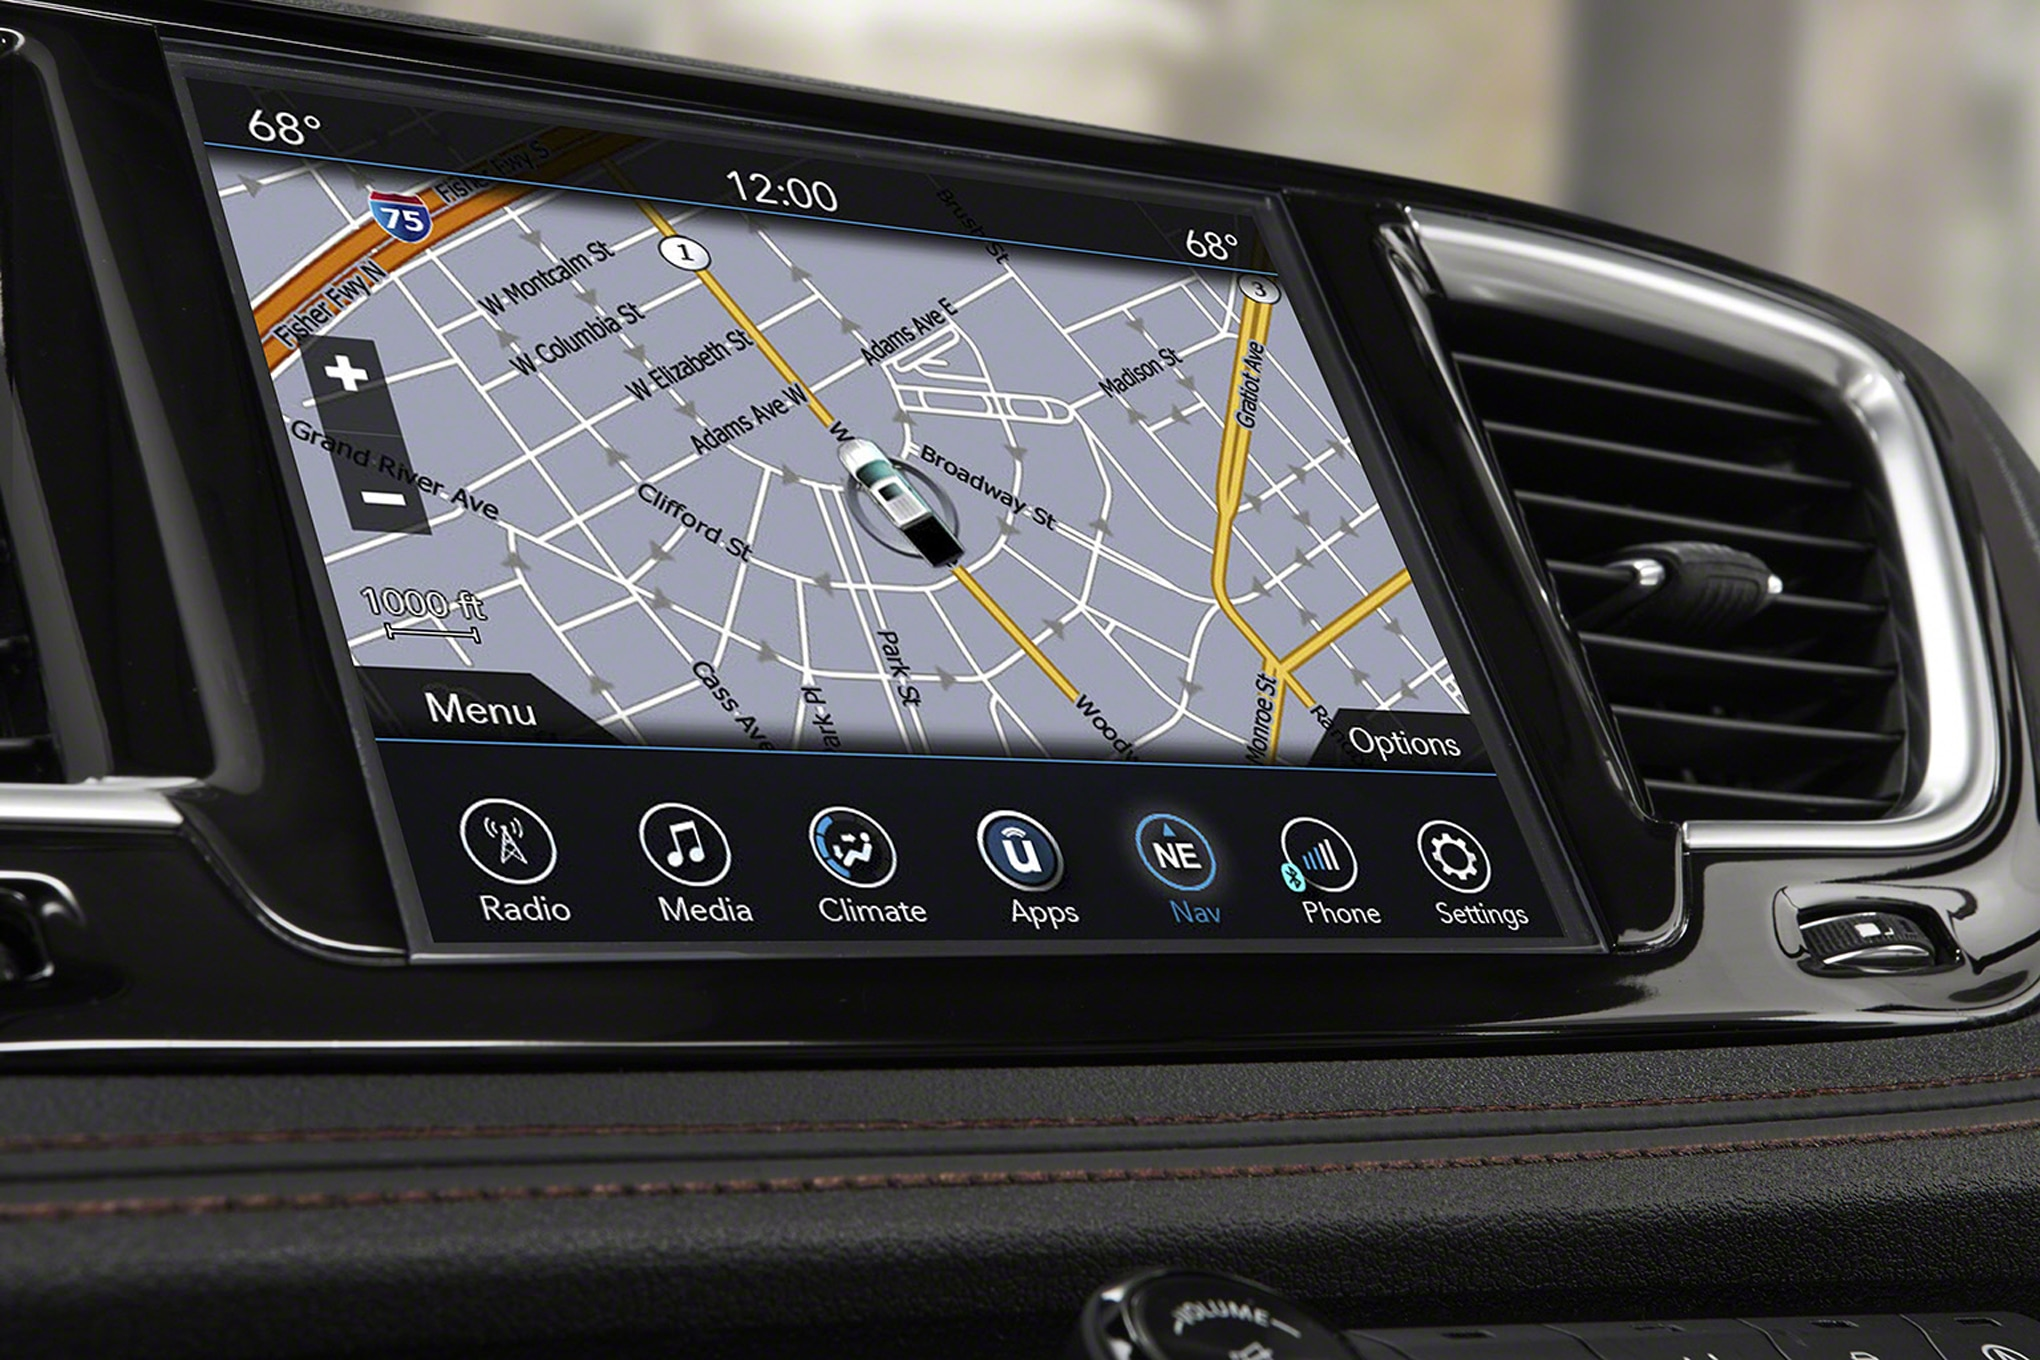 2017 Chrysler Pacifica Center Stack Navigation Screen 29 Junio 2016 Wpengine